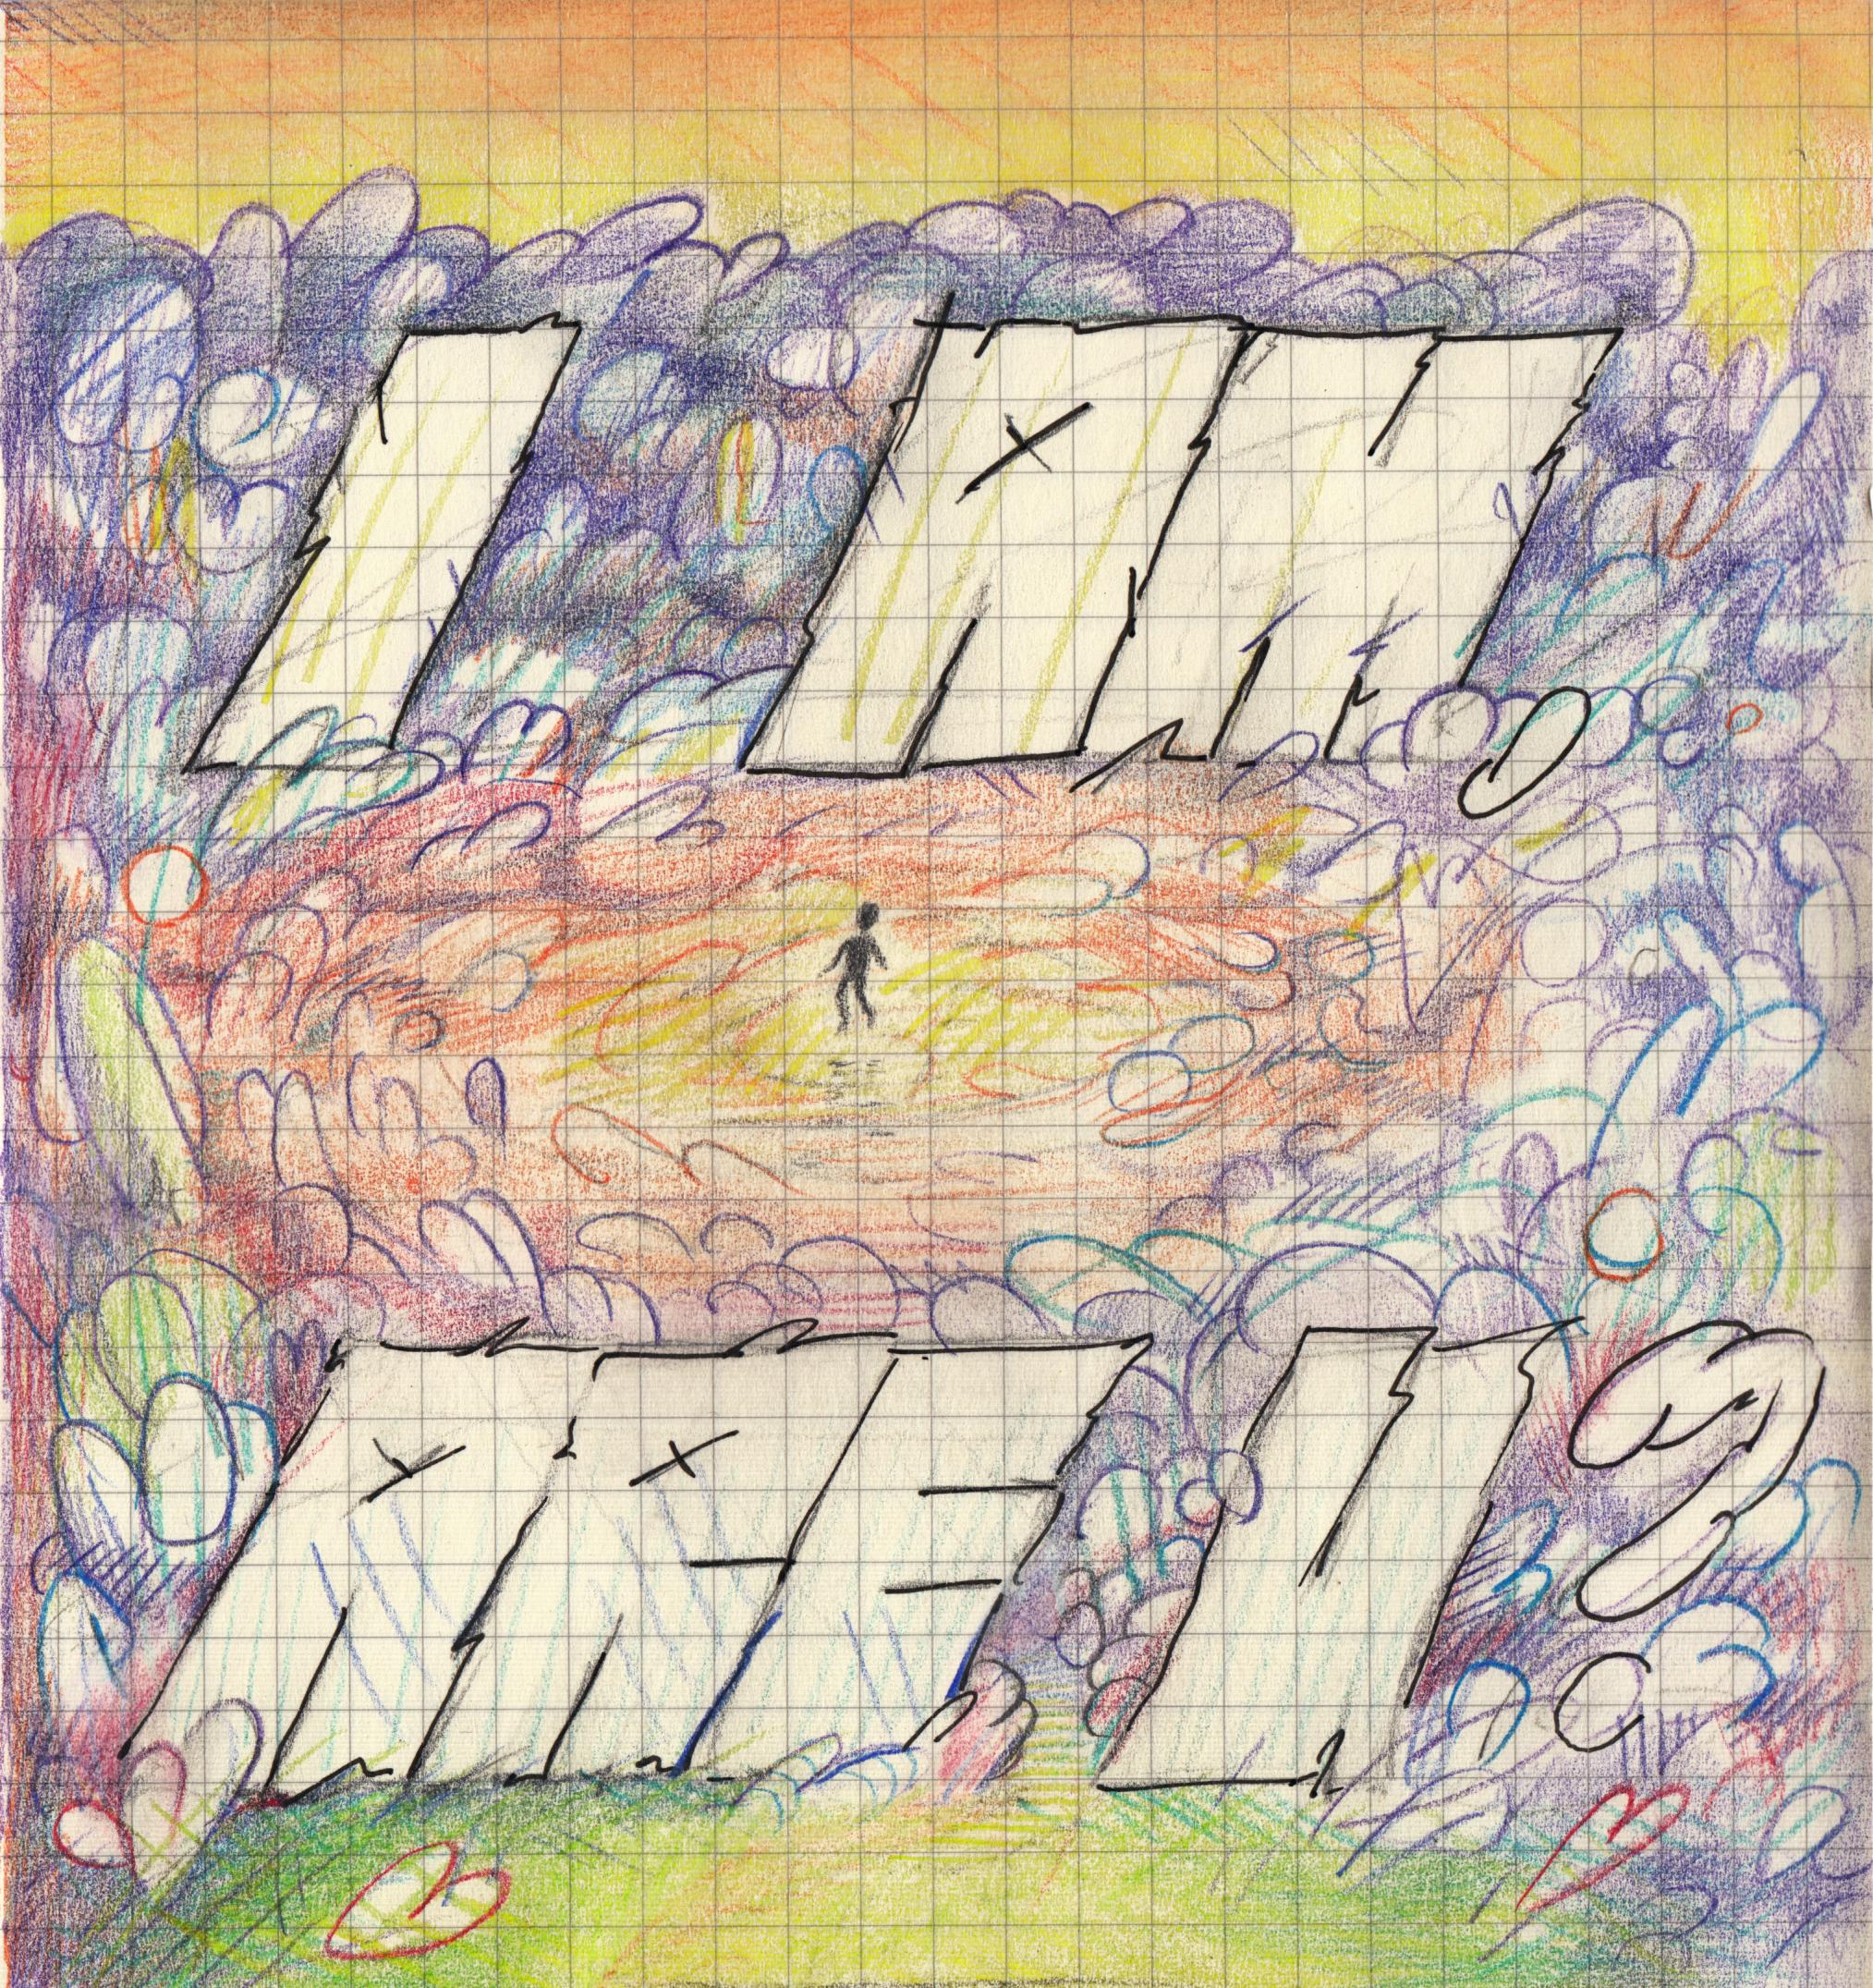 I AM, ARE U?